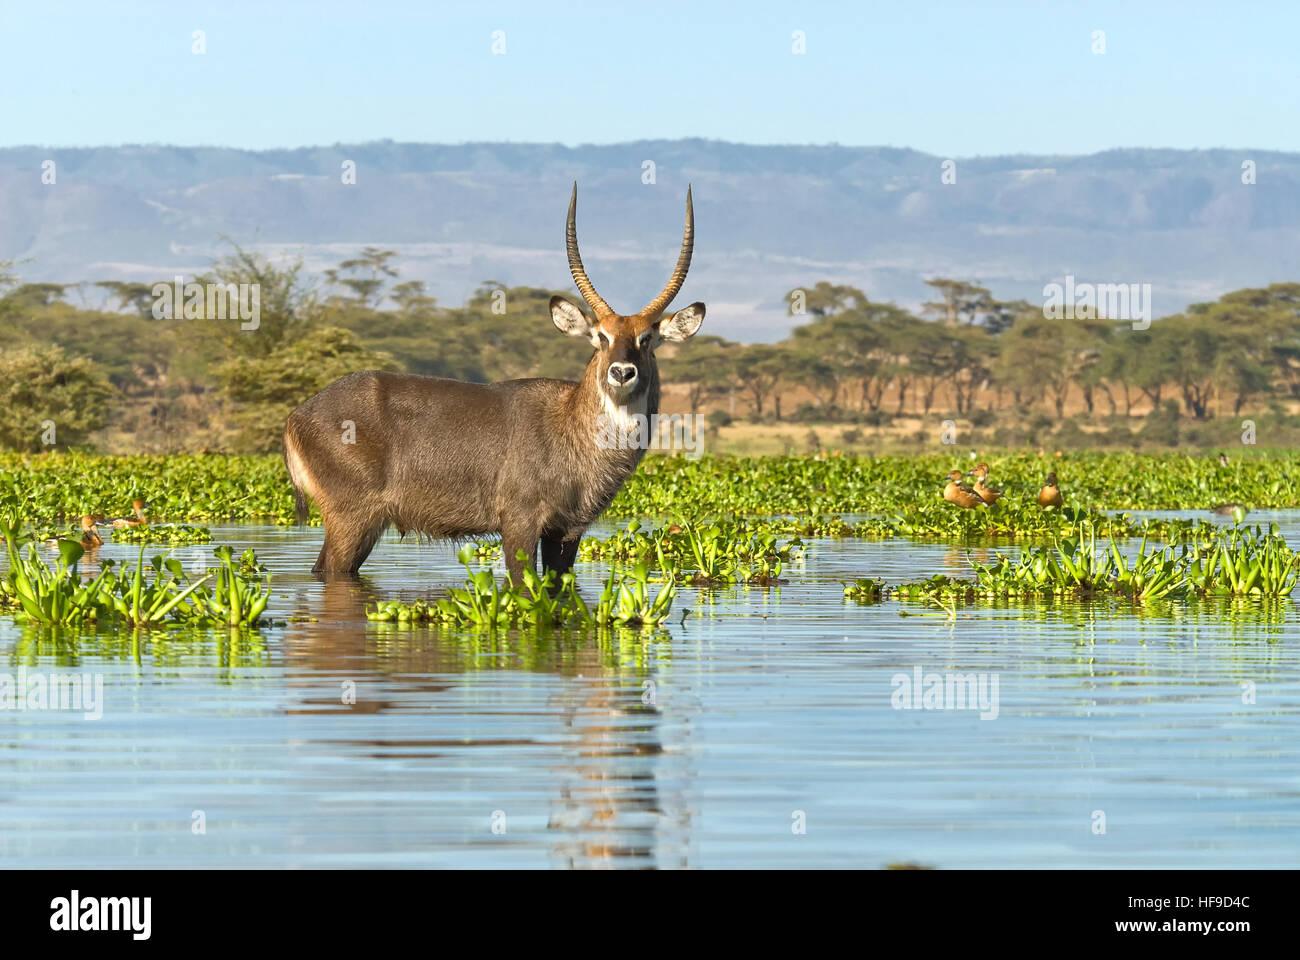 Wasser-Bock in Lake Naivasha Stockbild